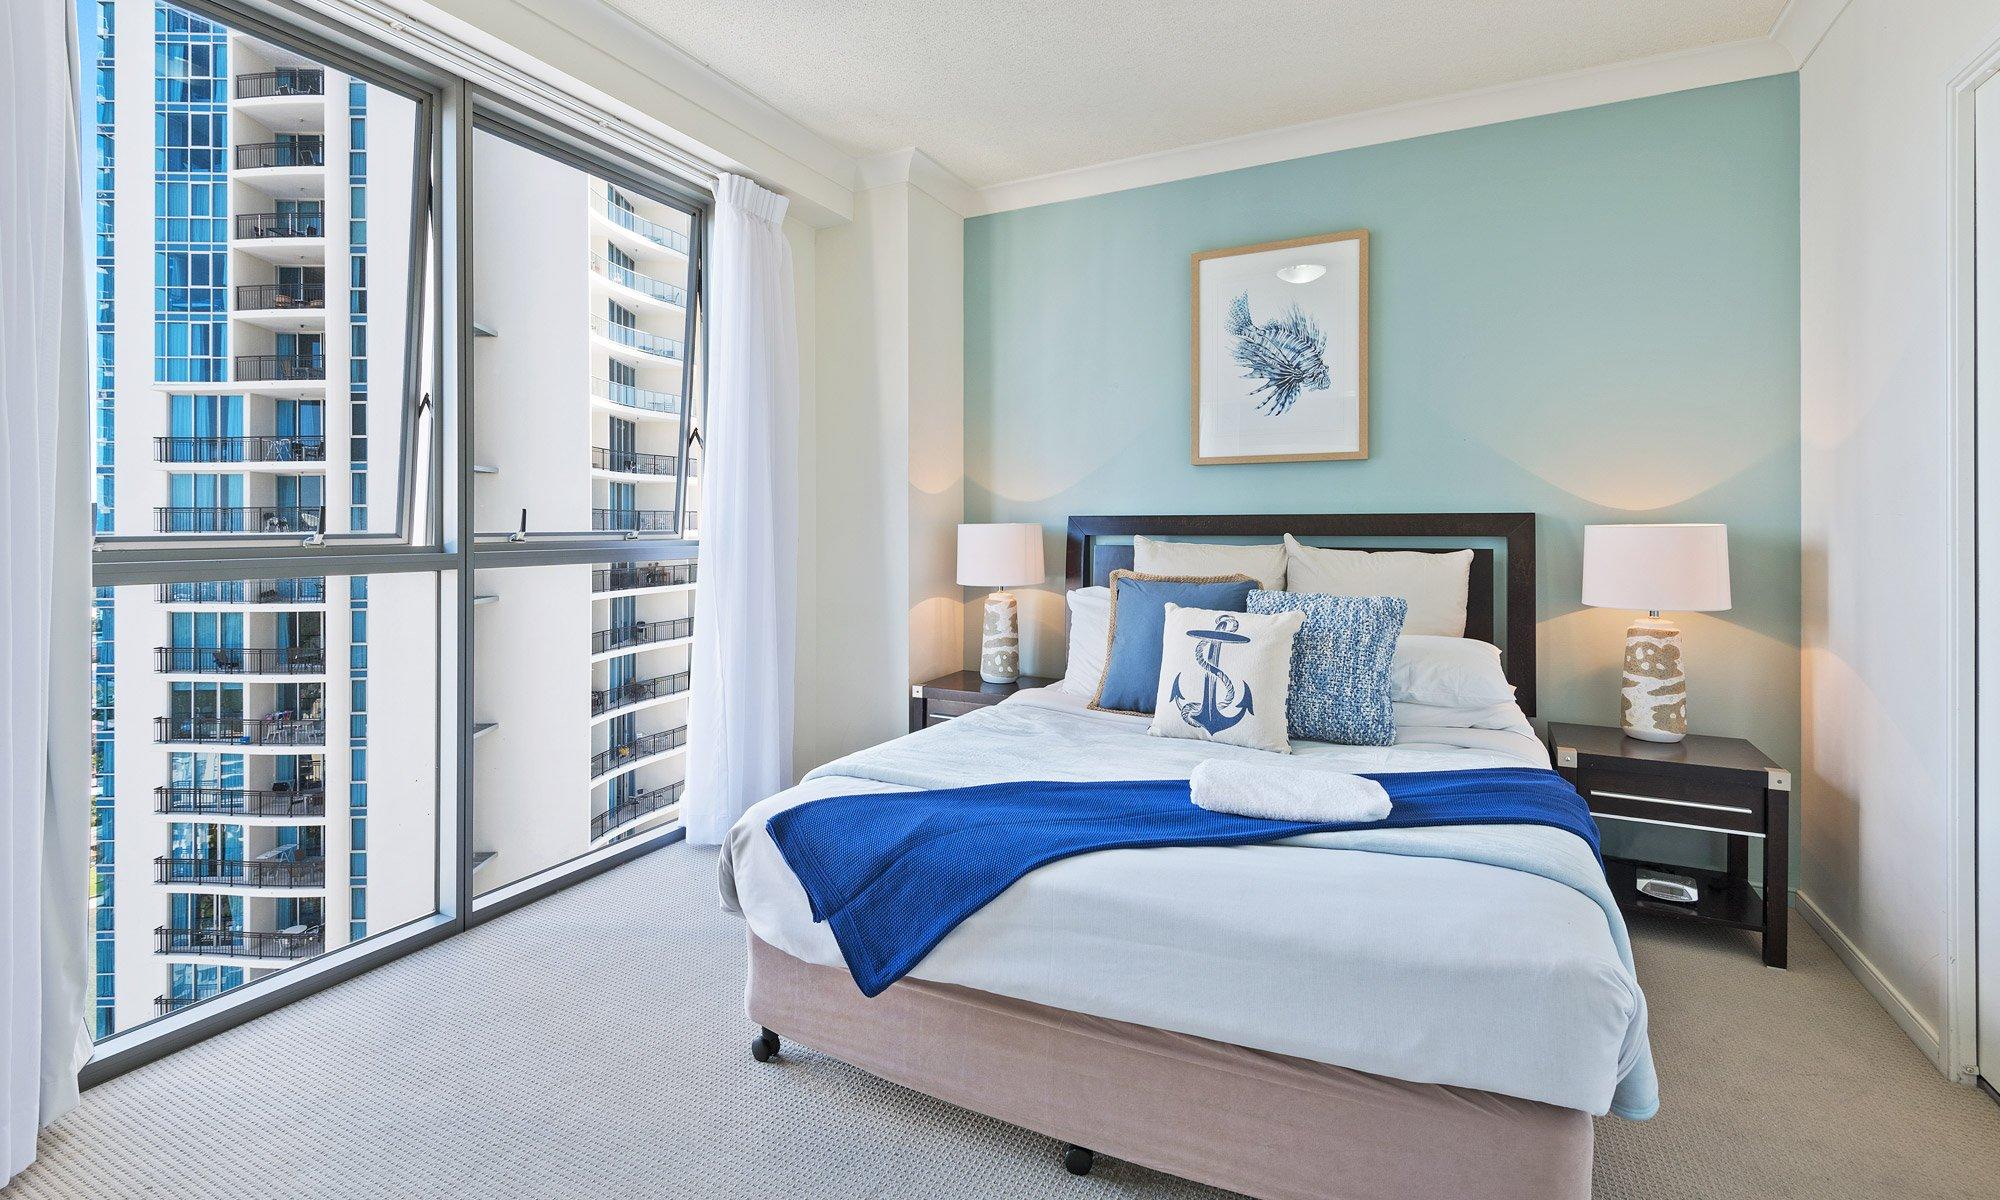 Gold Coast real estate for sale Chevron Renaissance 1264 second bedroom